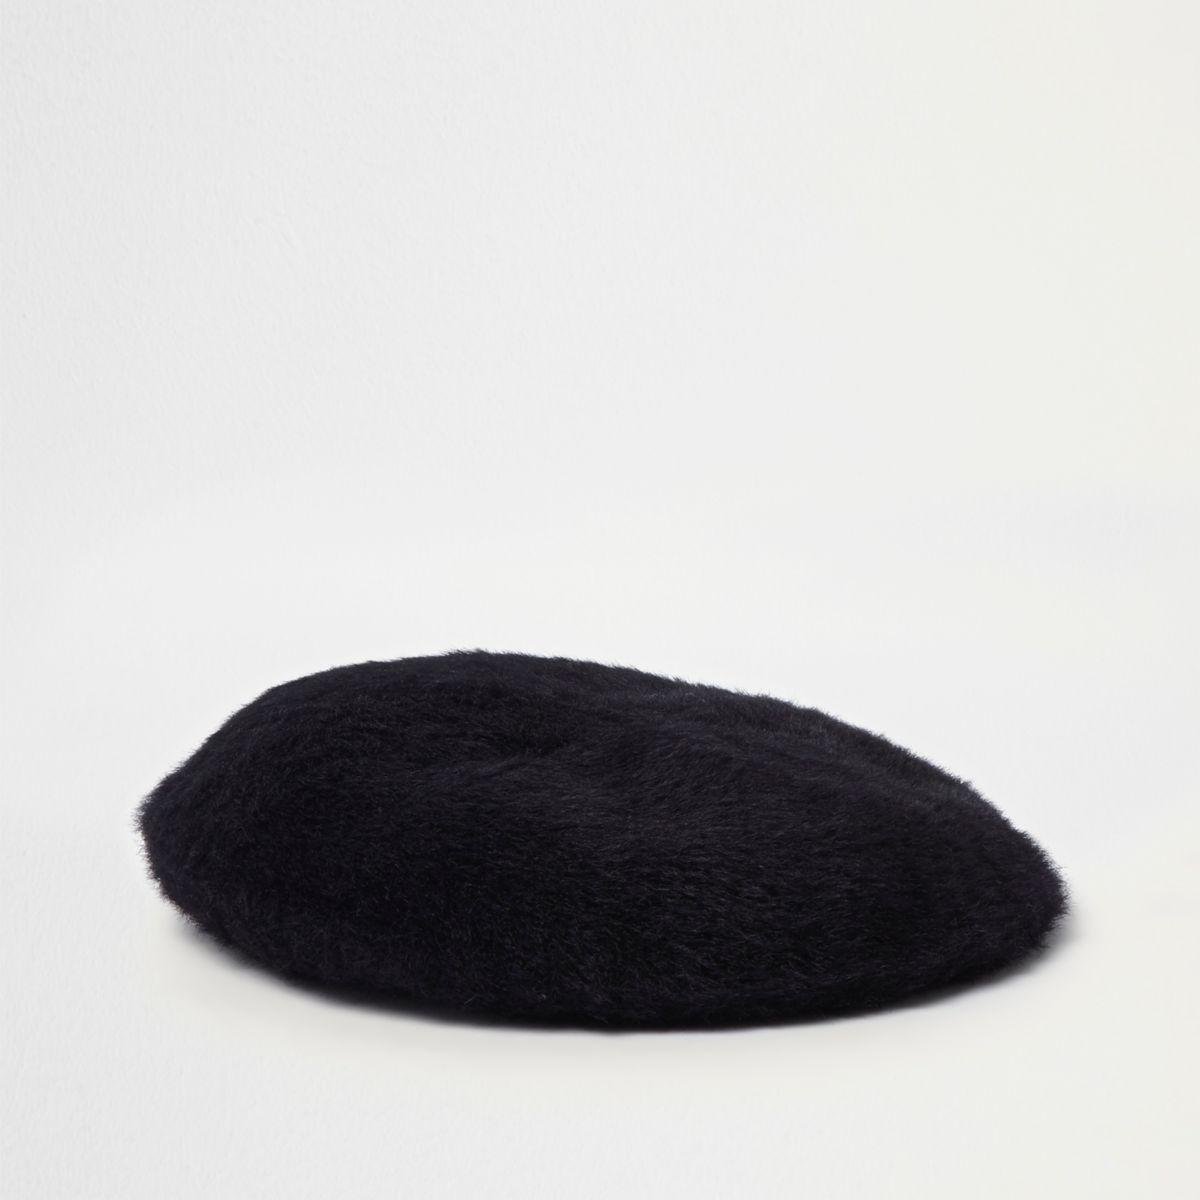 Black fluffy felt beret